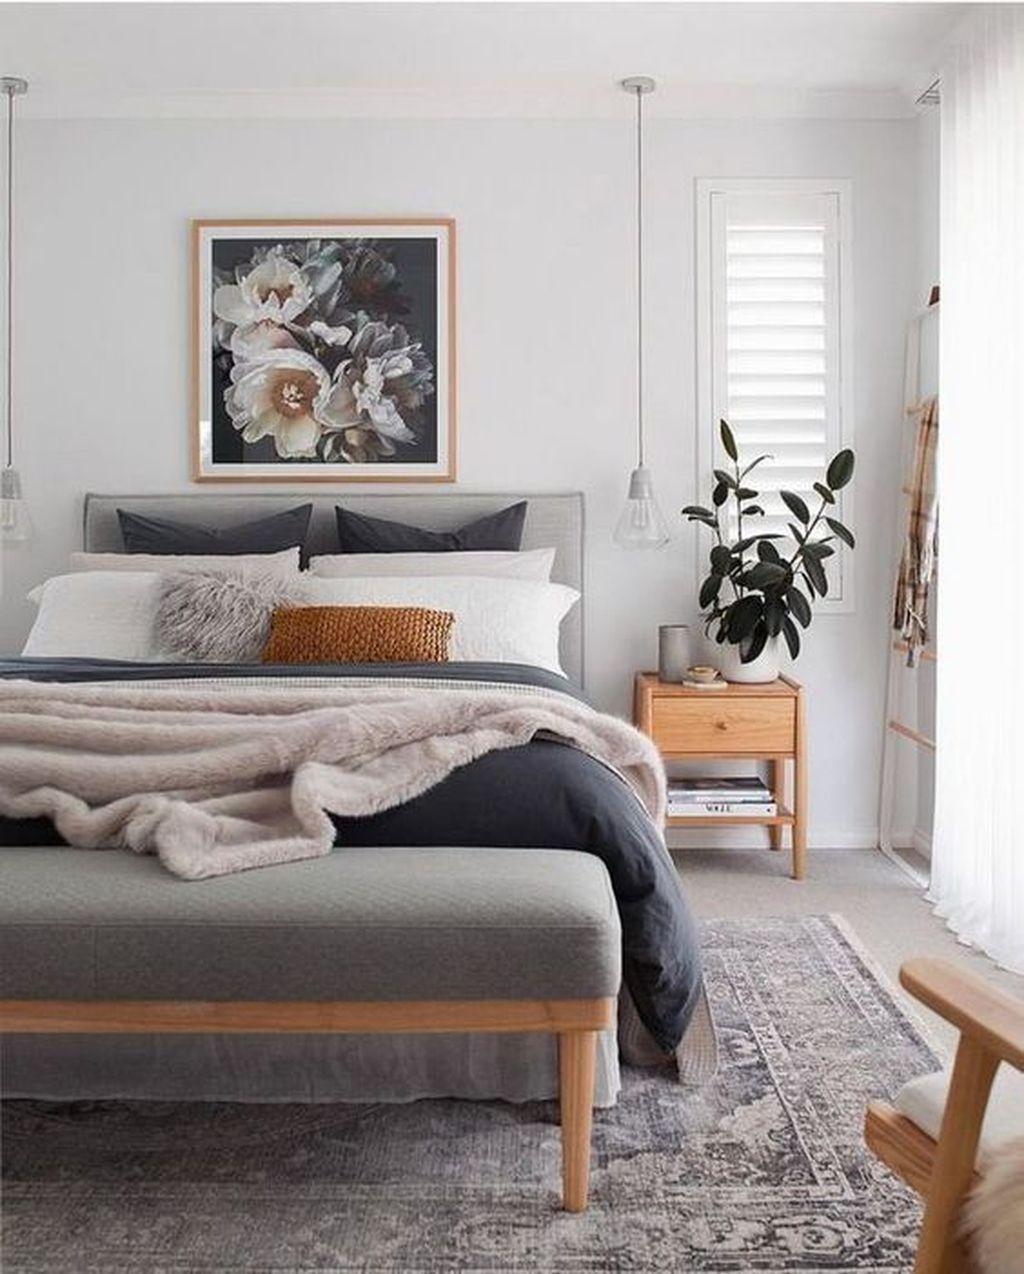 Best Minimalist Bedroom Design Ideas To Try Asap 37